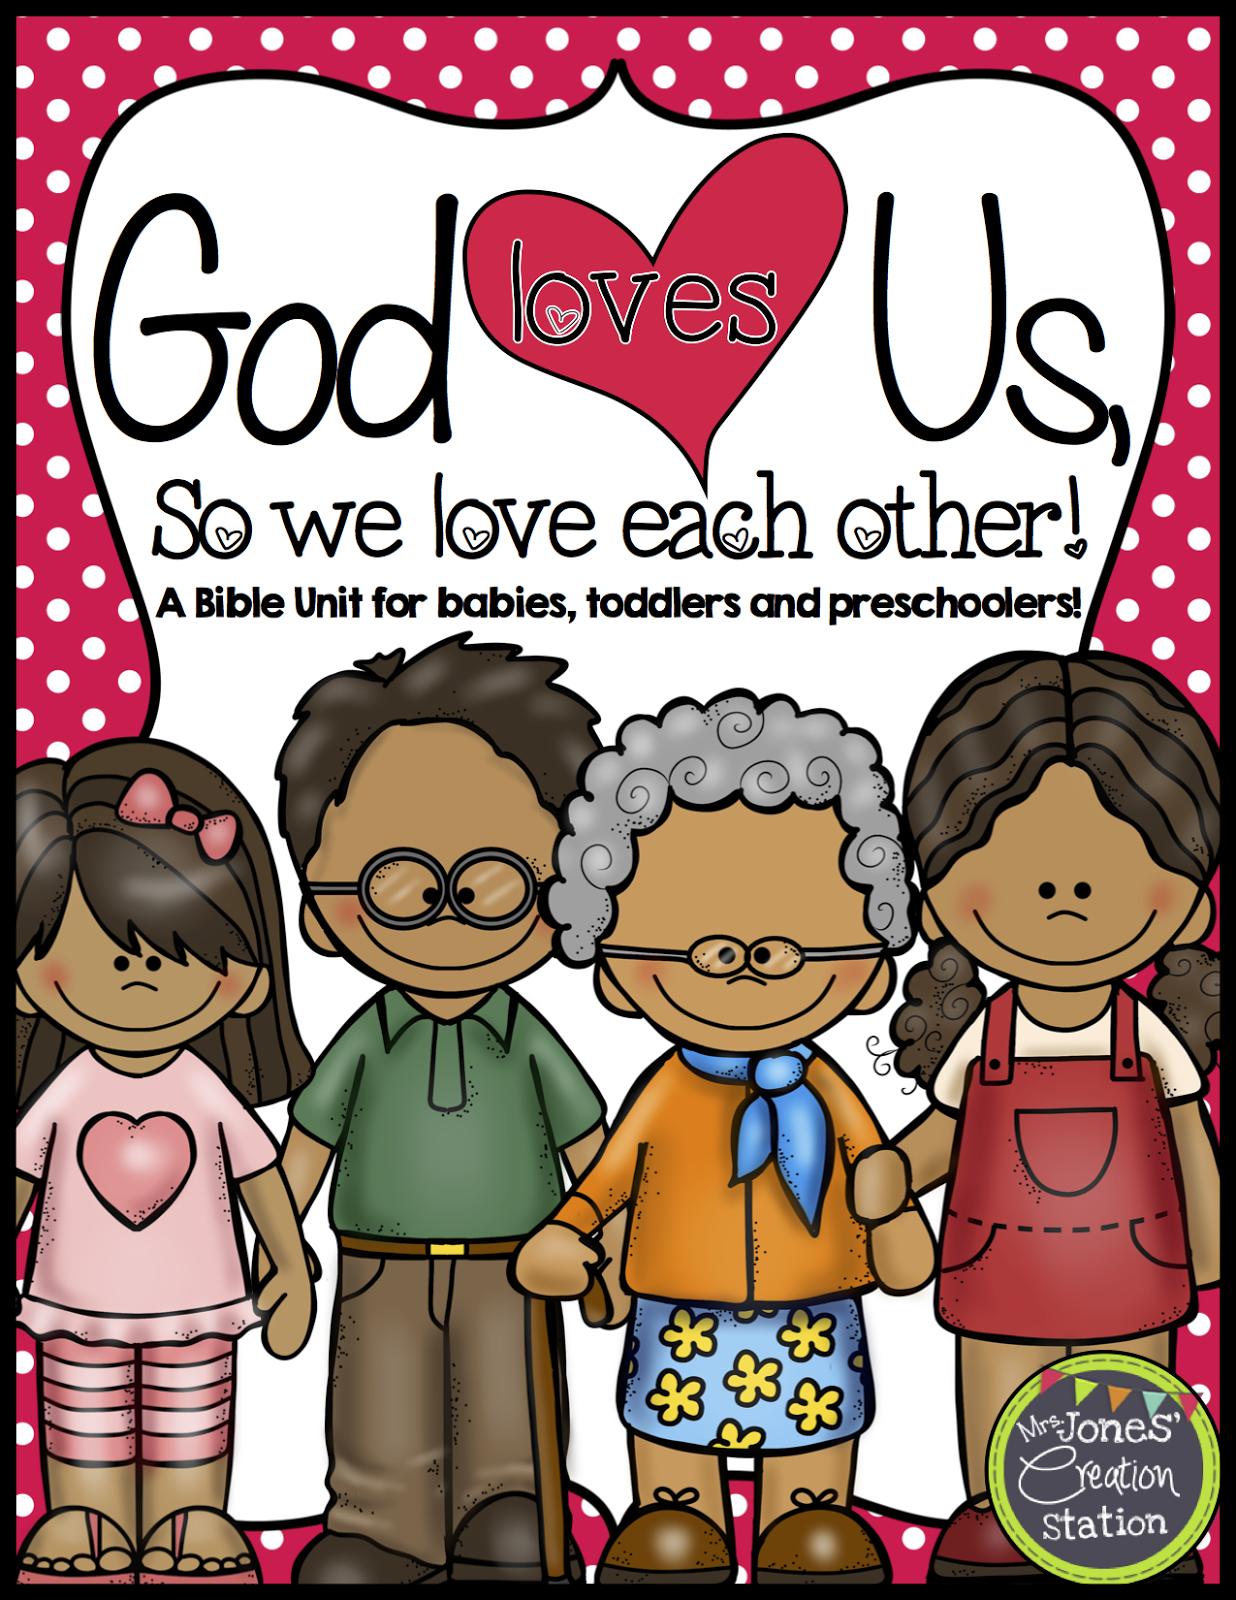 God Loves Us So We Love Each Other Unit For Babies